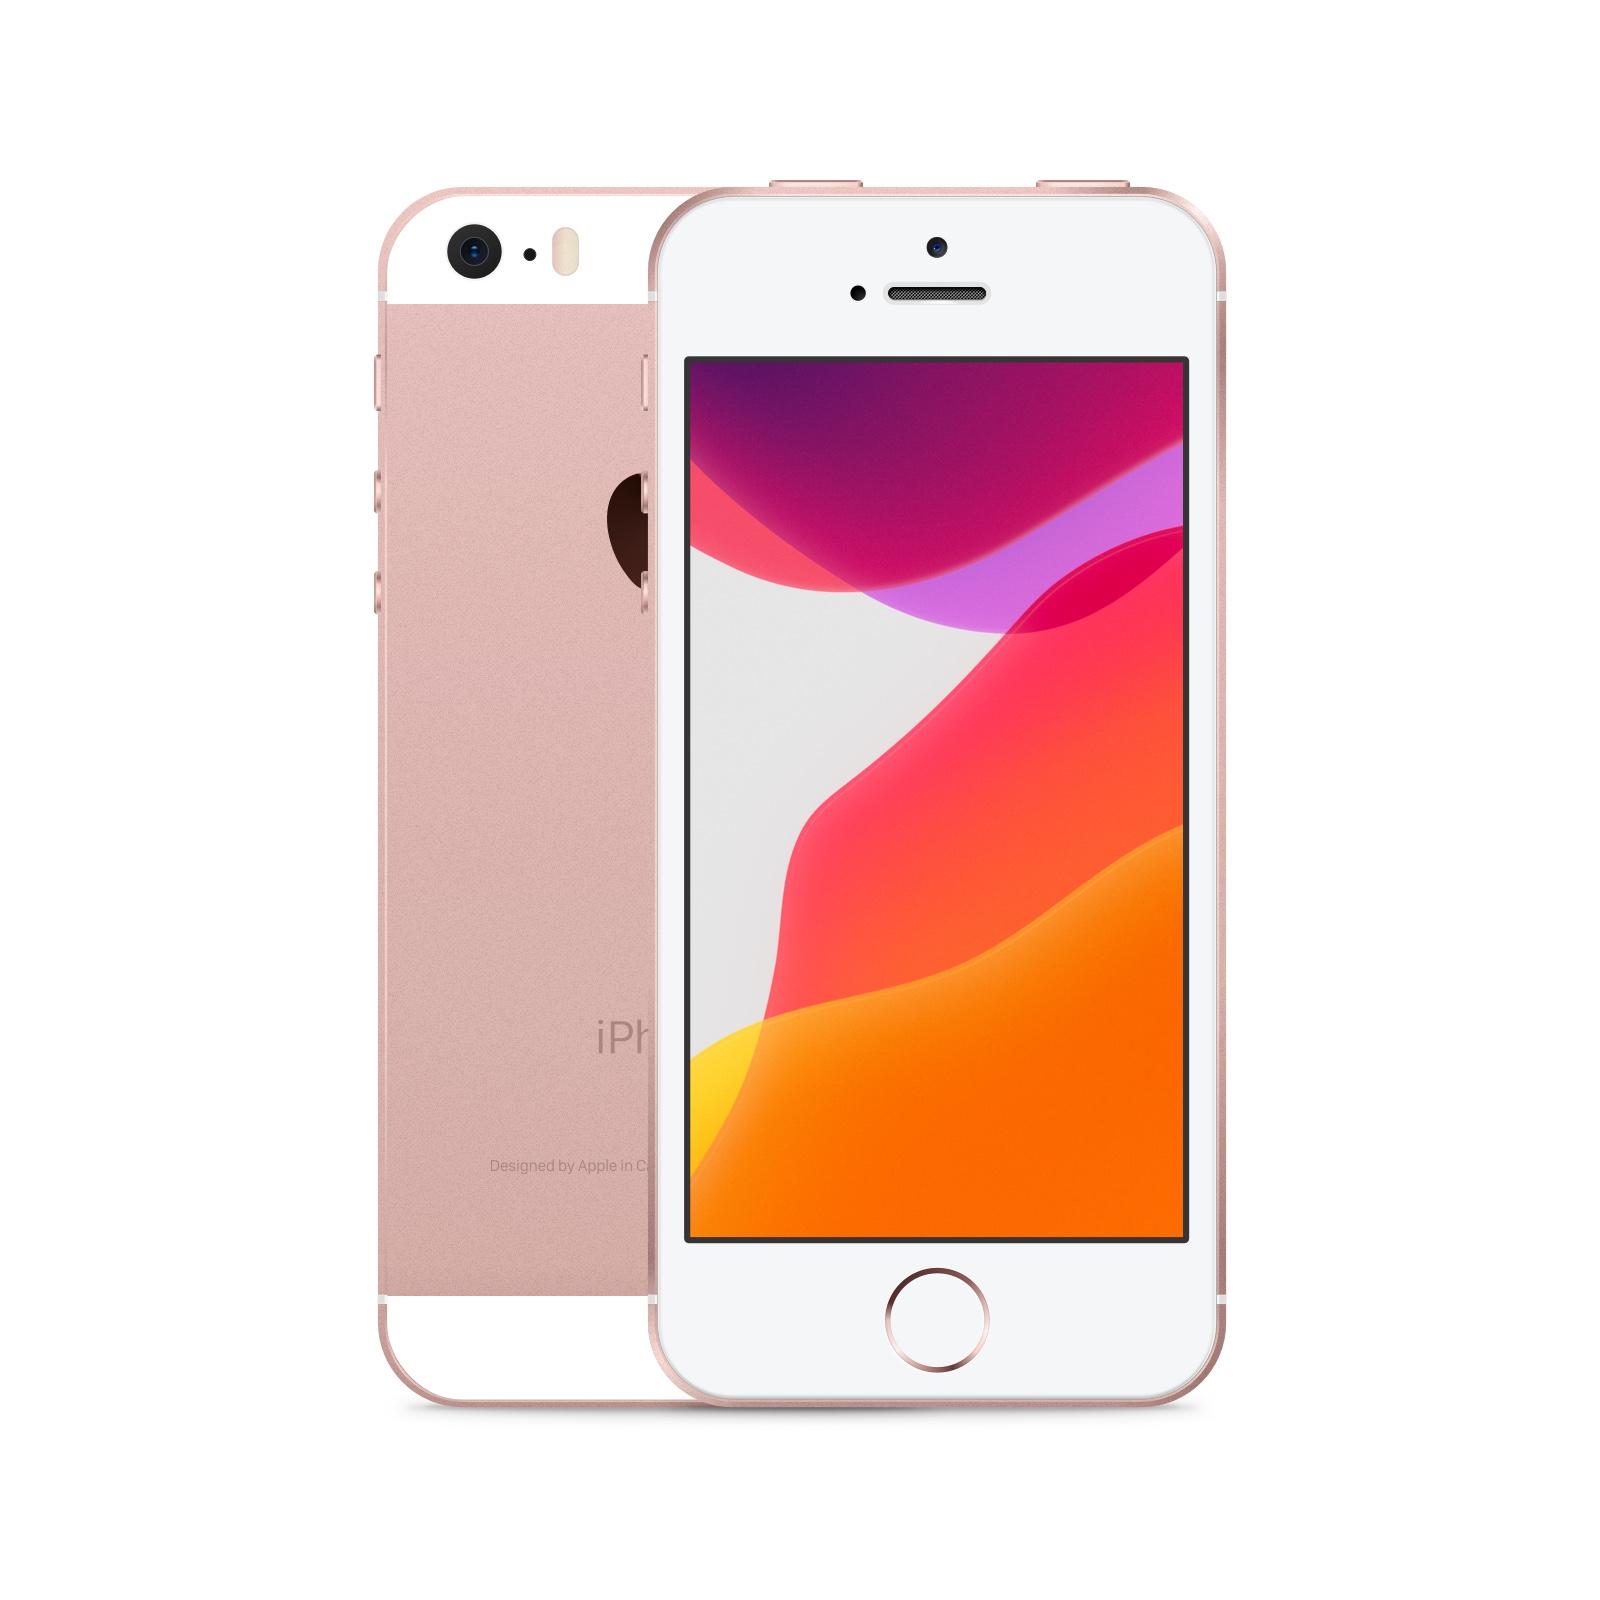 iPhone SE 20GB Roségold   Swappie